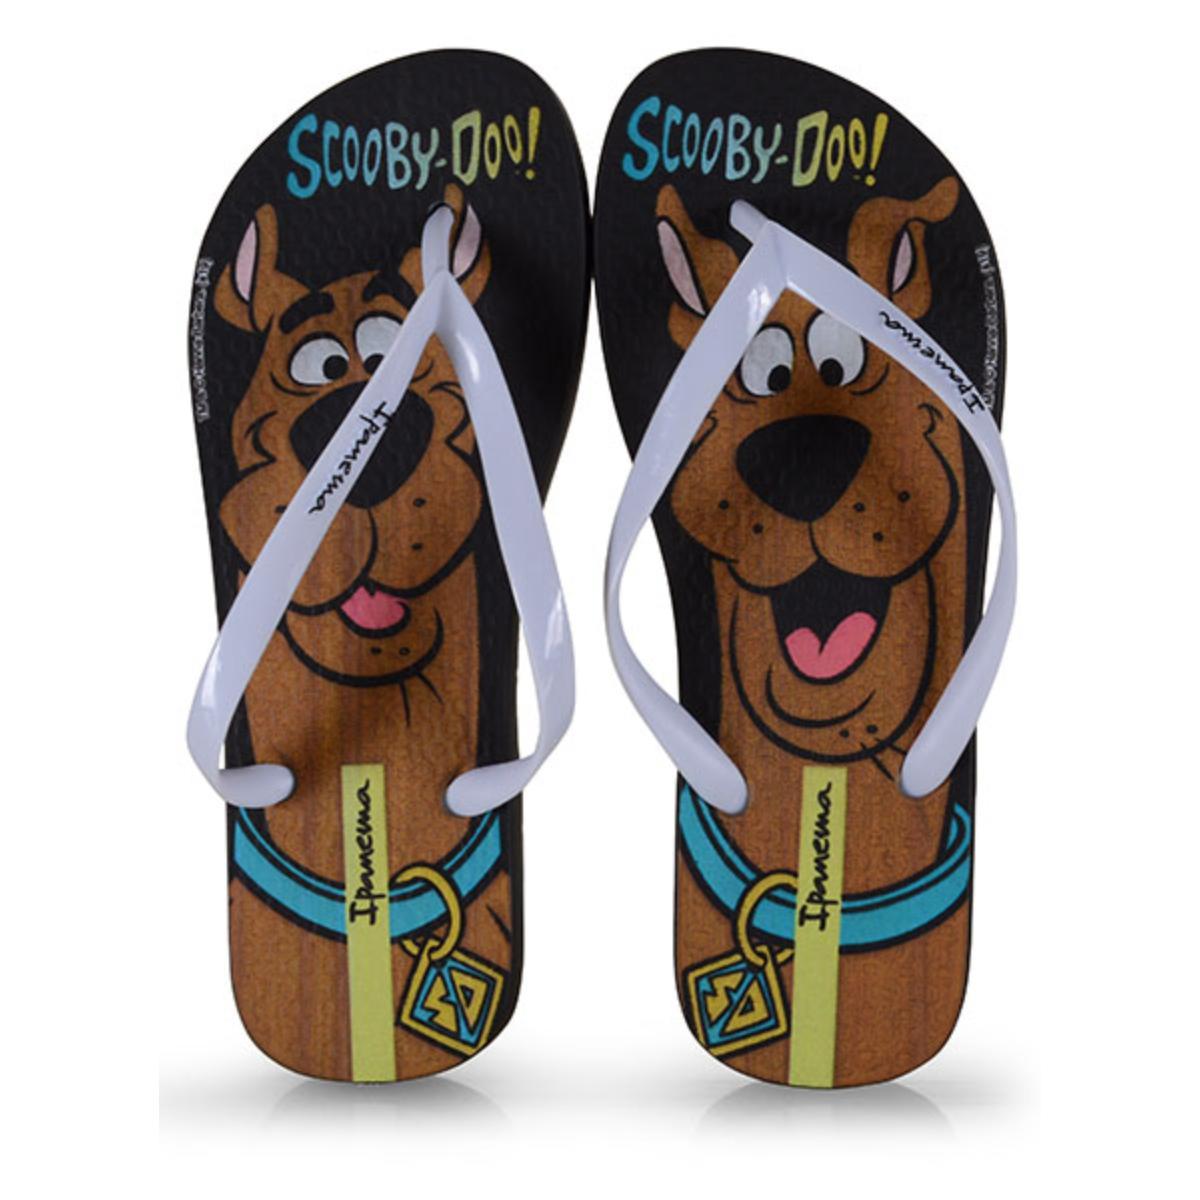 Chinelo Feminino Grendene 26458 21668 Ipanema Scooby Doo Preto/branco